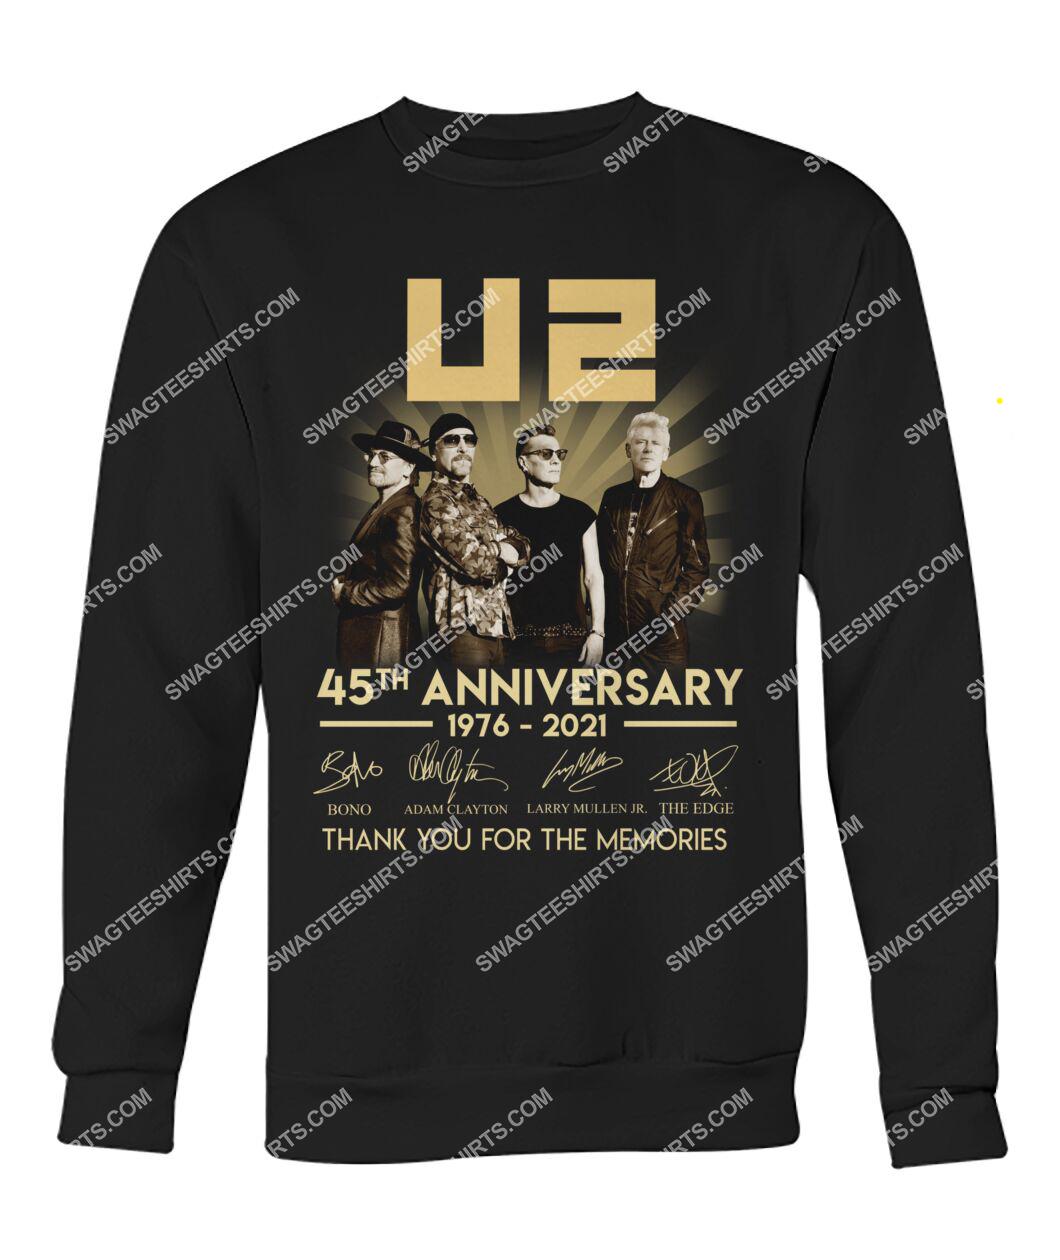 u2 music band 45th anniversary thank you for memories signatures sweatshirt 1